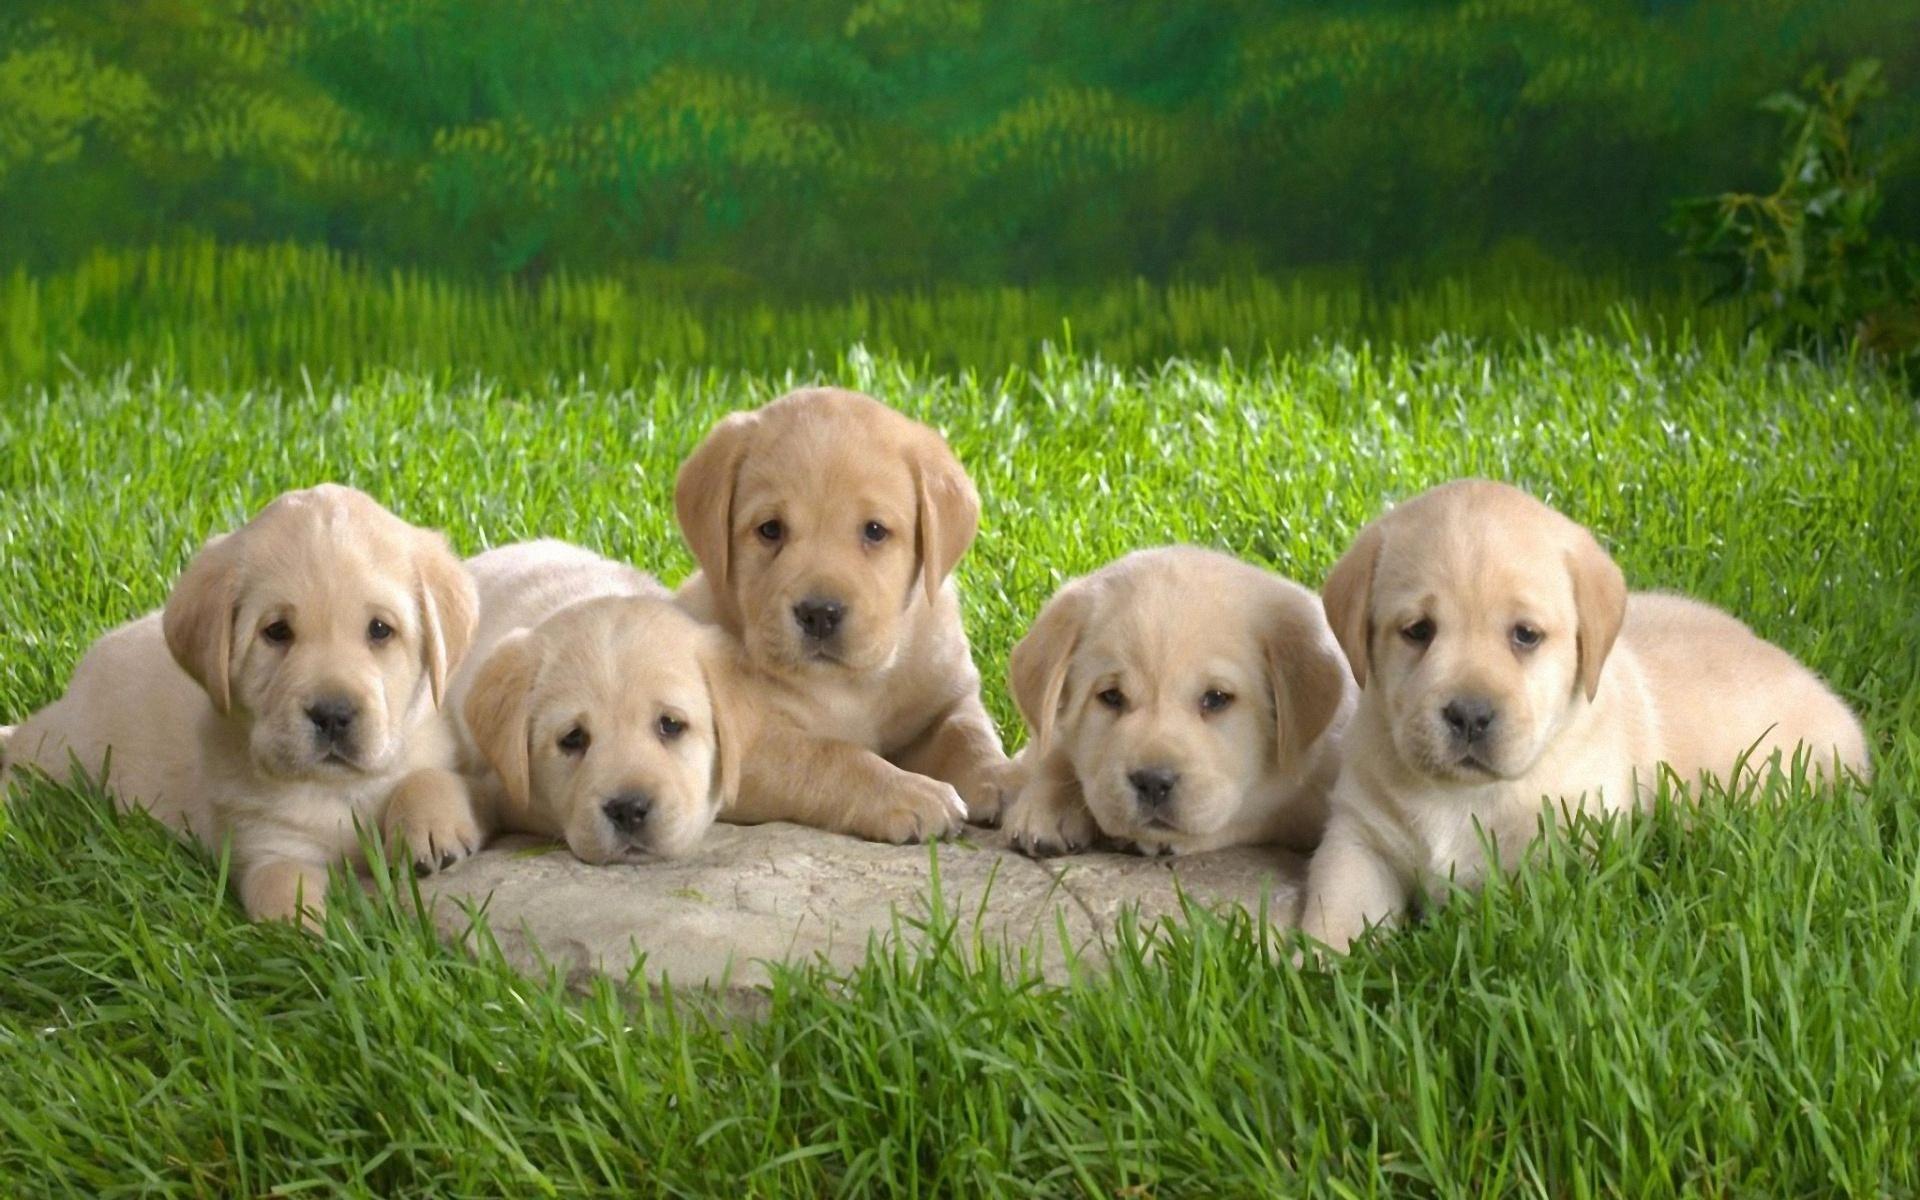 Free download Cute Puppies HD Desktop Wallpaper HD Desktop